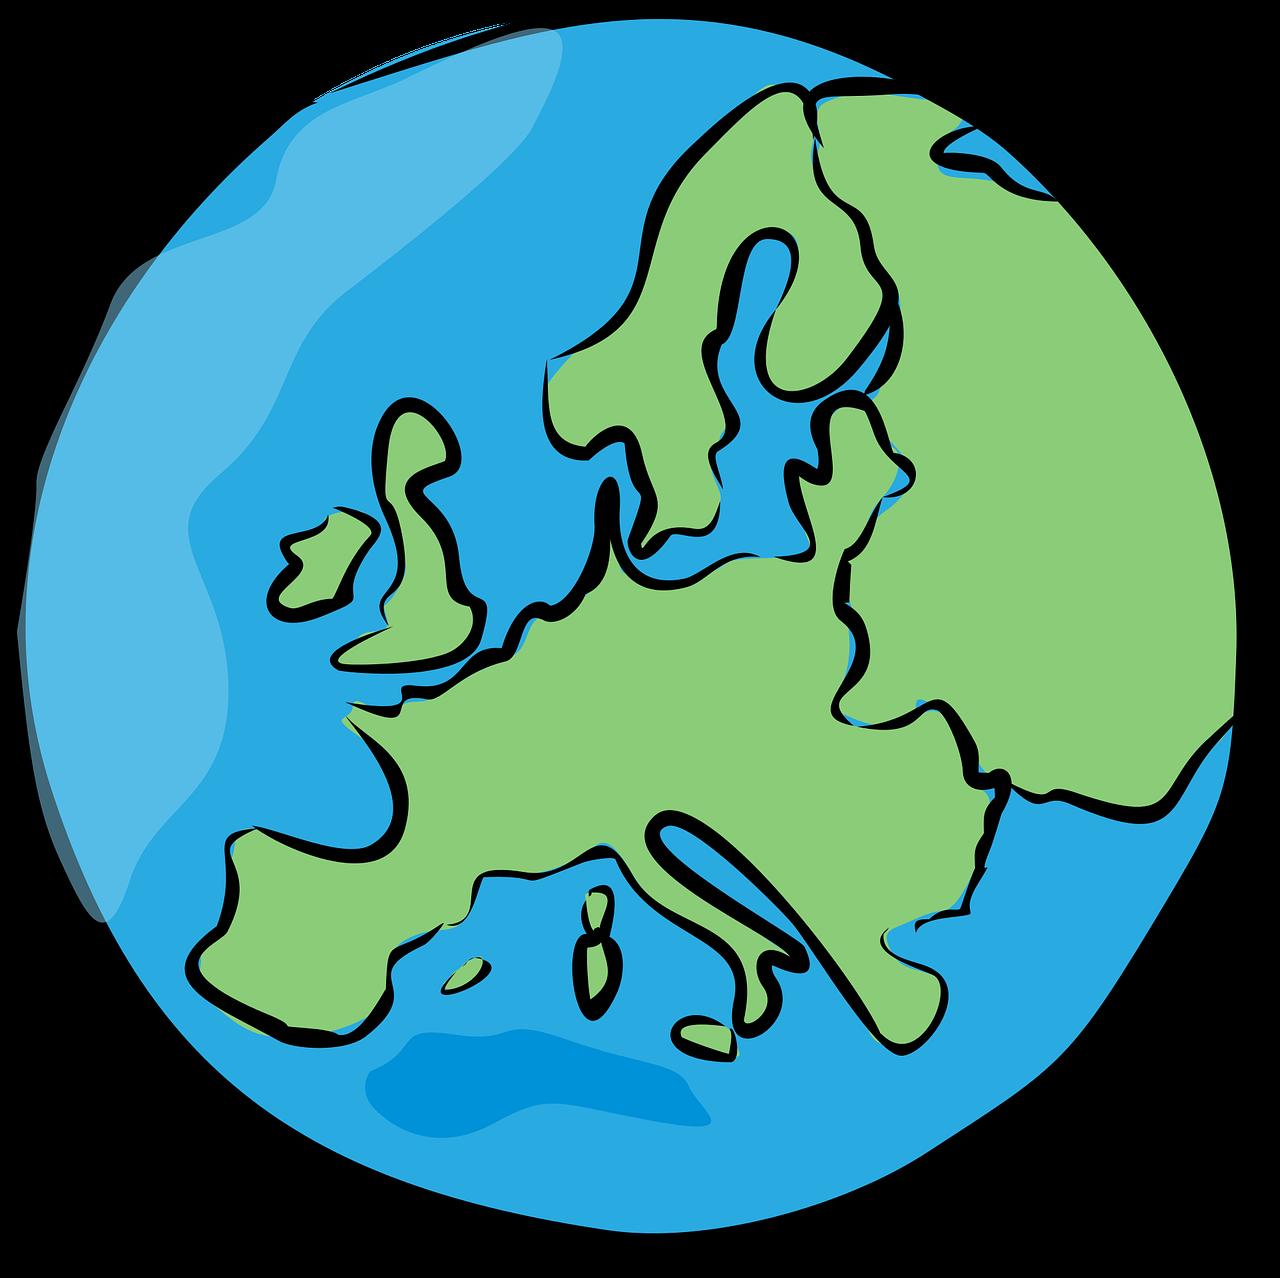 Europe World Globe Free Vector Graphic On Pixabay